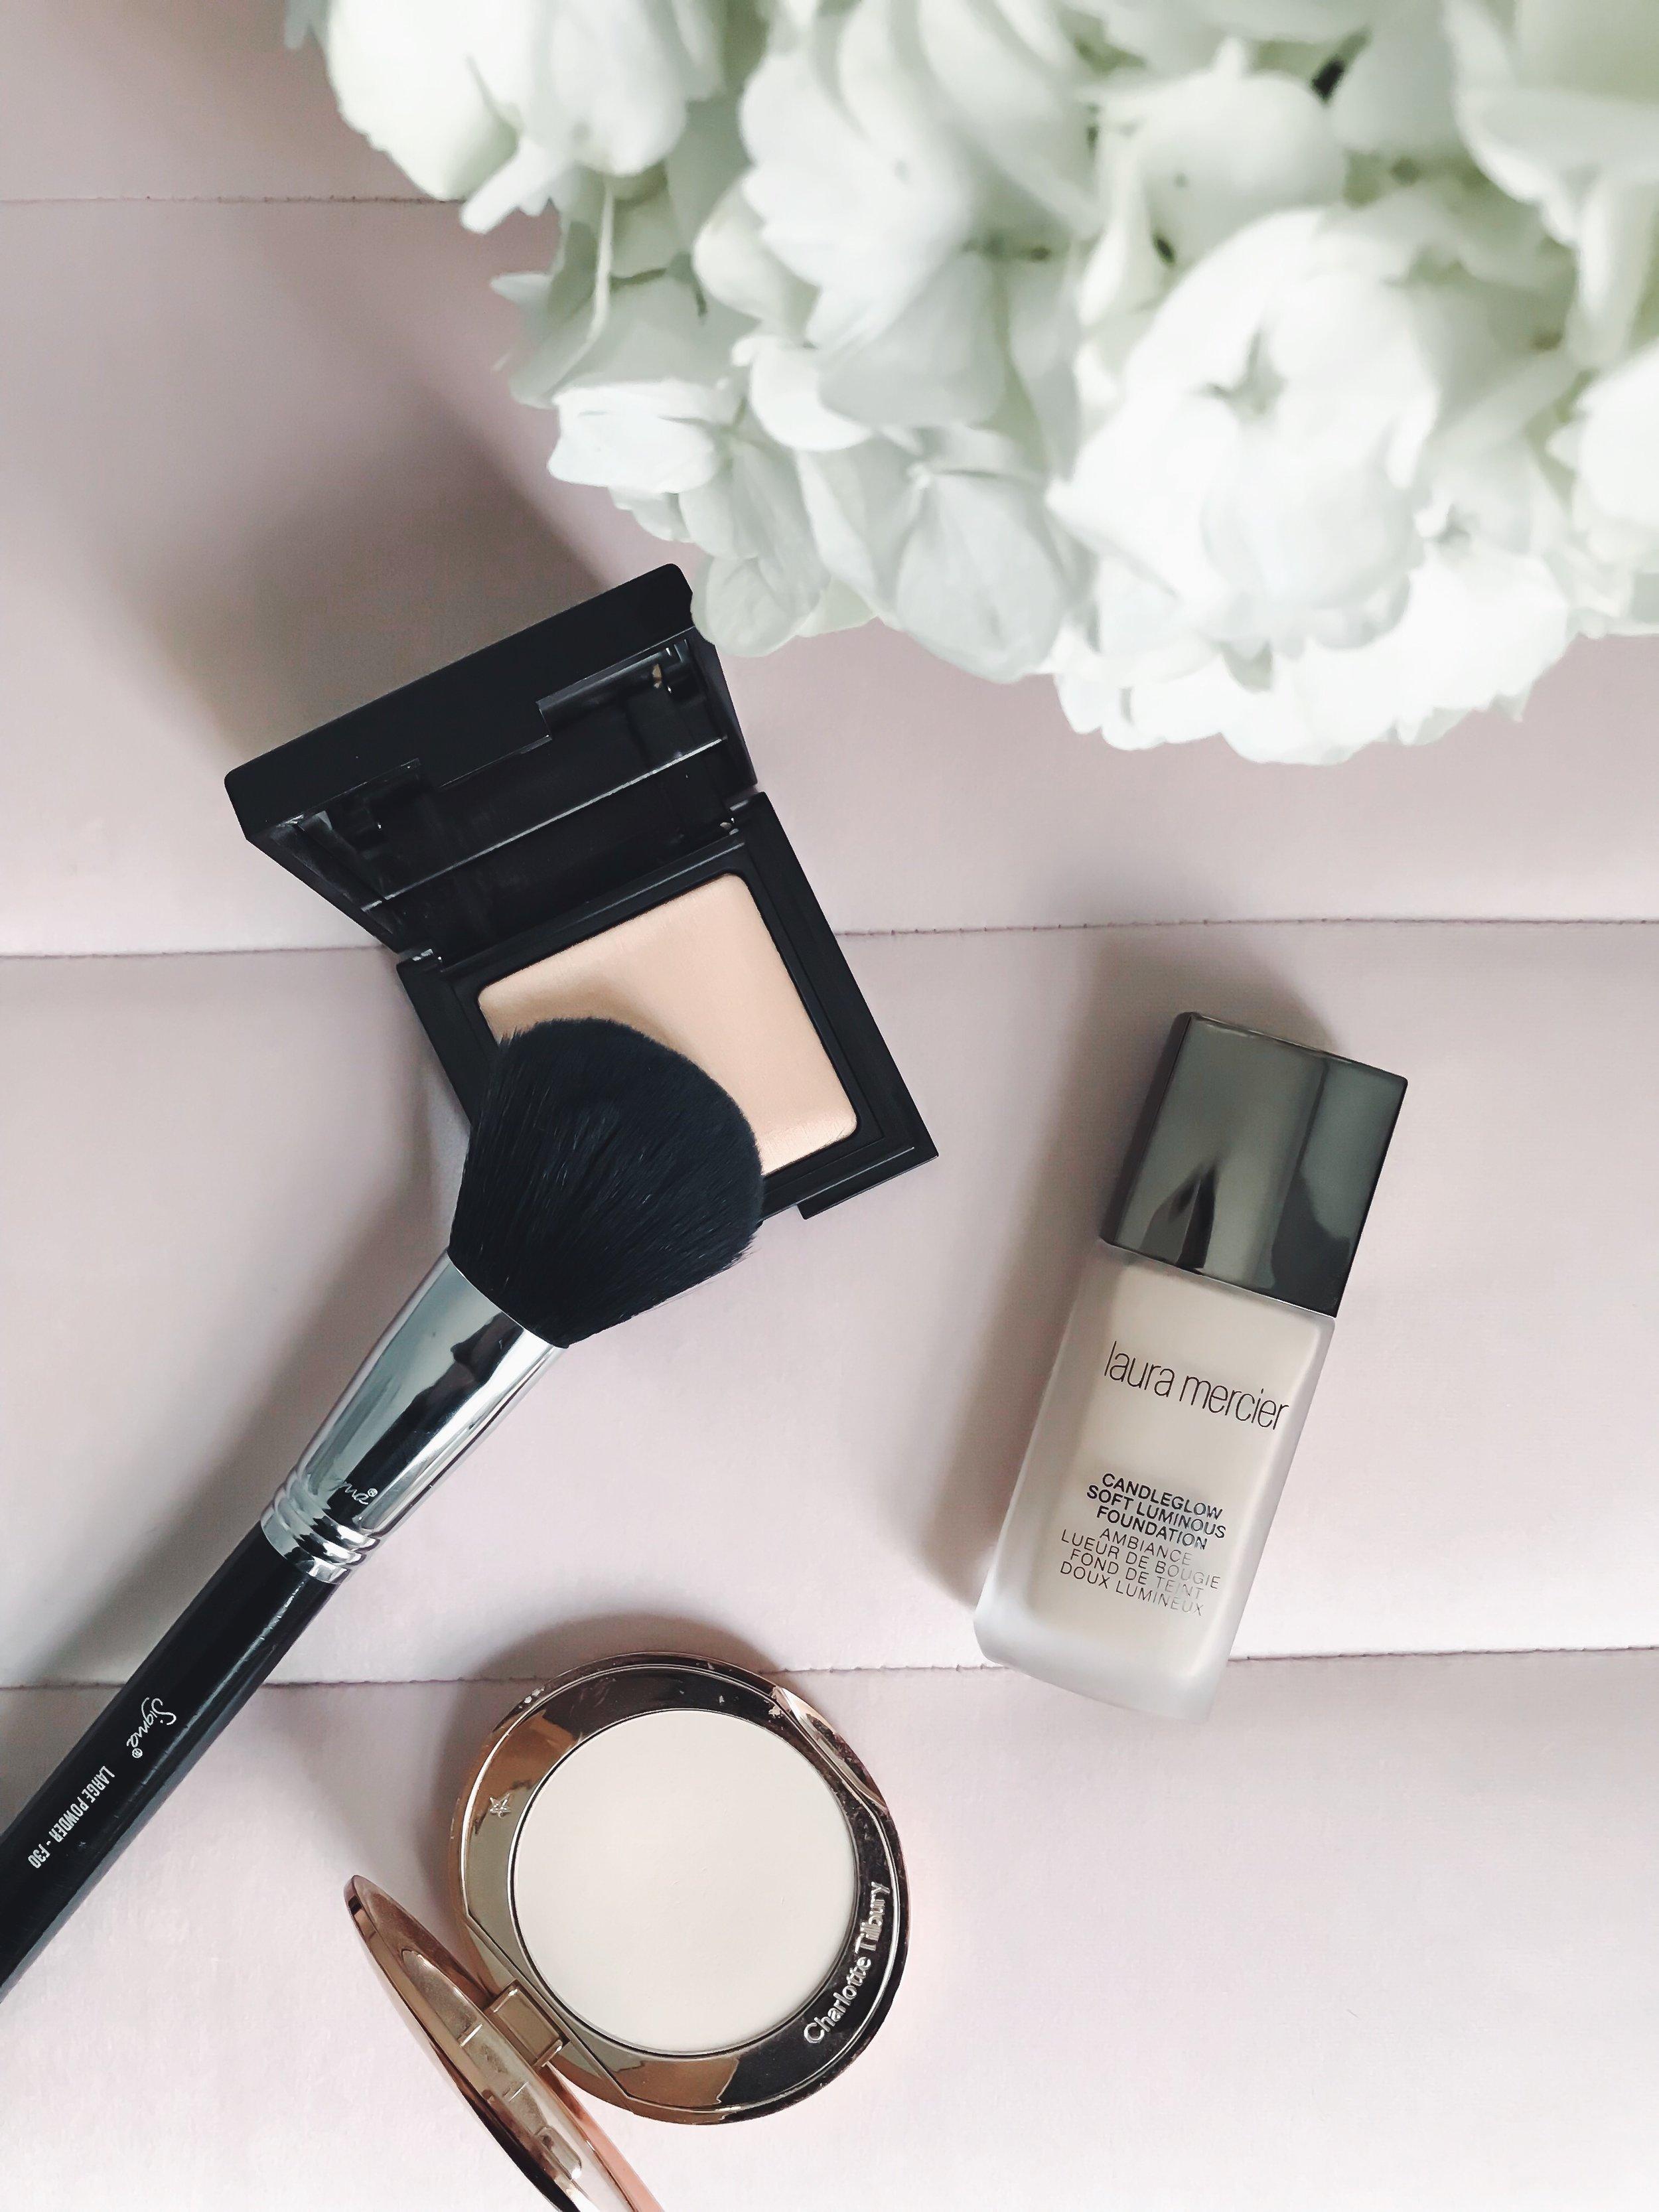 Recent Beauty Buys | Pine Barren Beauty | Laura Mercier foundation, Charlotte Tilbury setting powder, Laura Mercier setting powder, beauty product review, beauty product flat lay